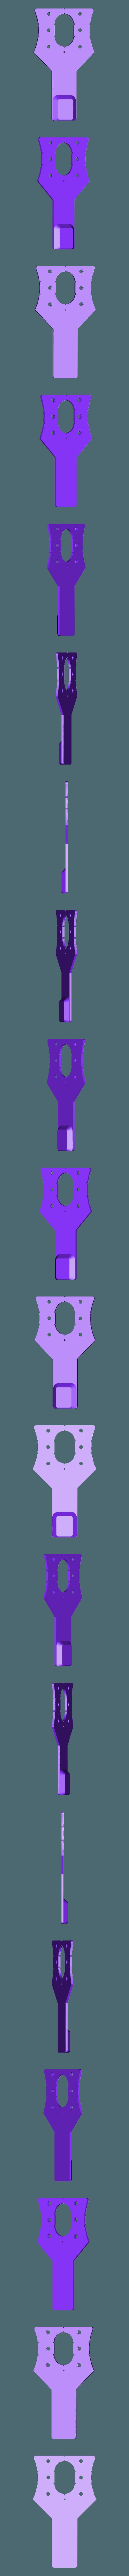 Support_gopro_bed_base.stl Download free STL file GoPro support for Artillery Sidewinder X1 • 3D printable object, alpo16000